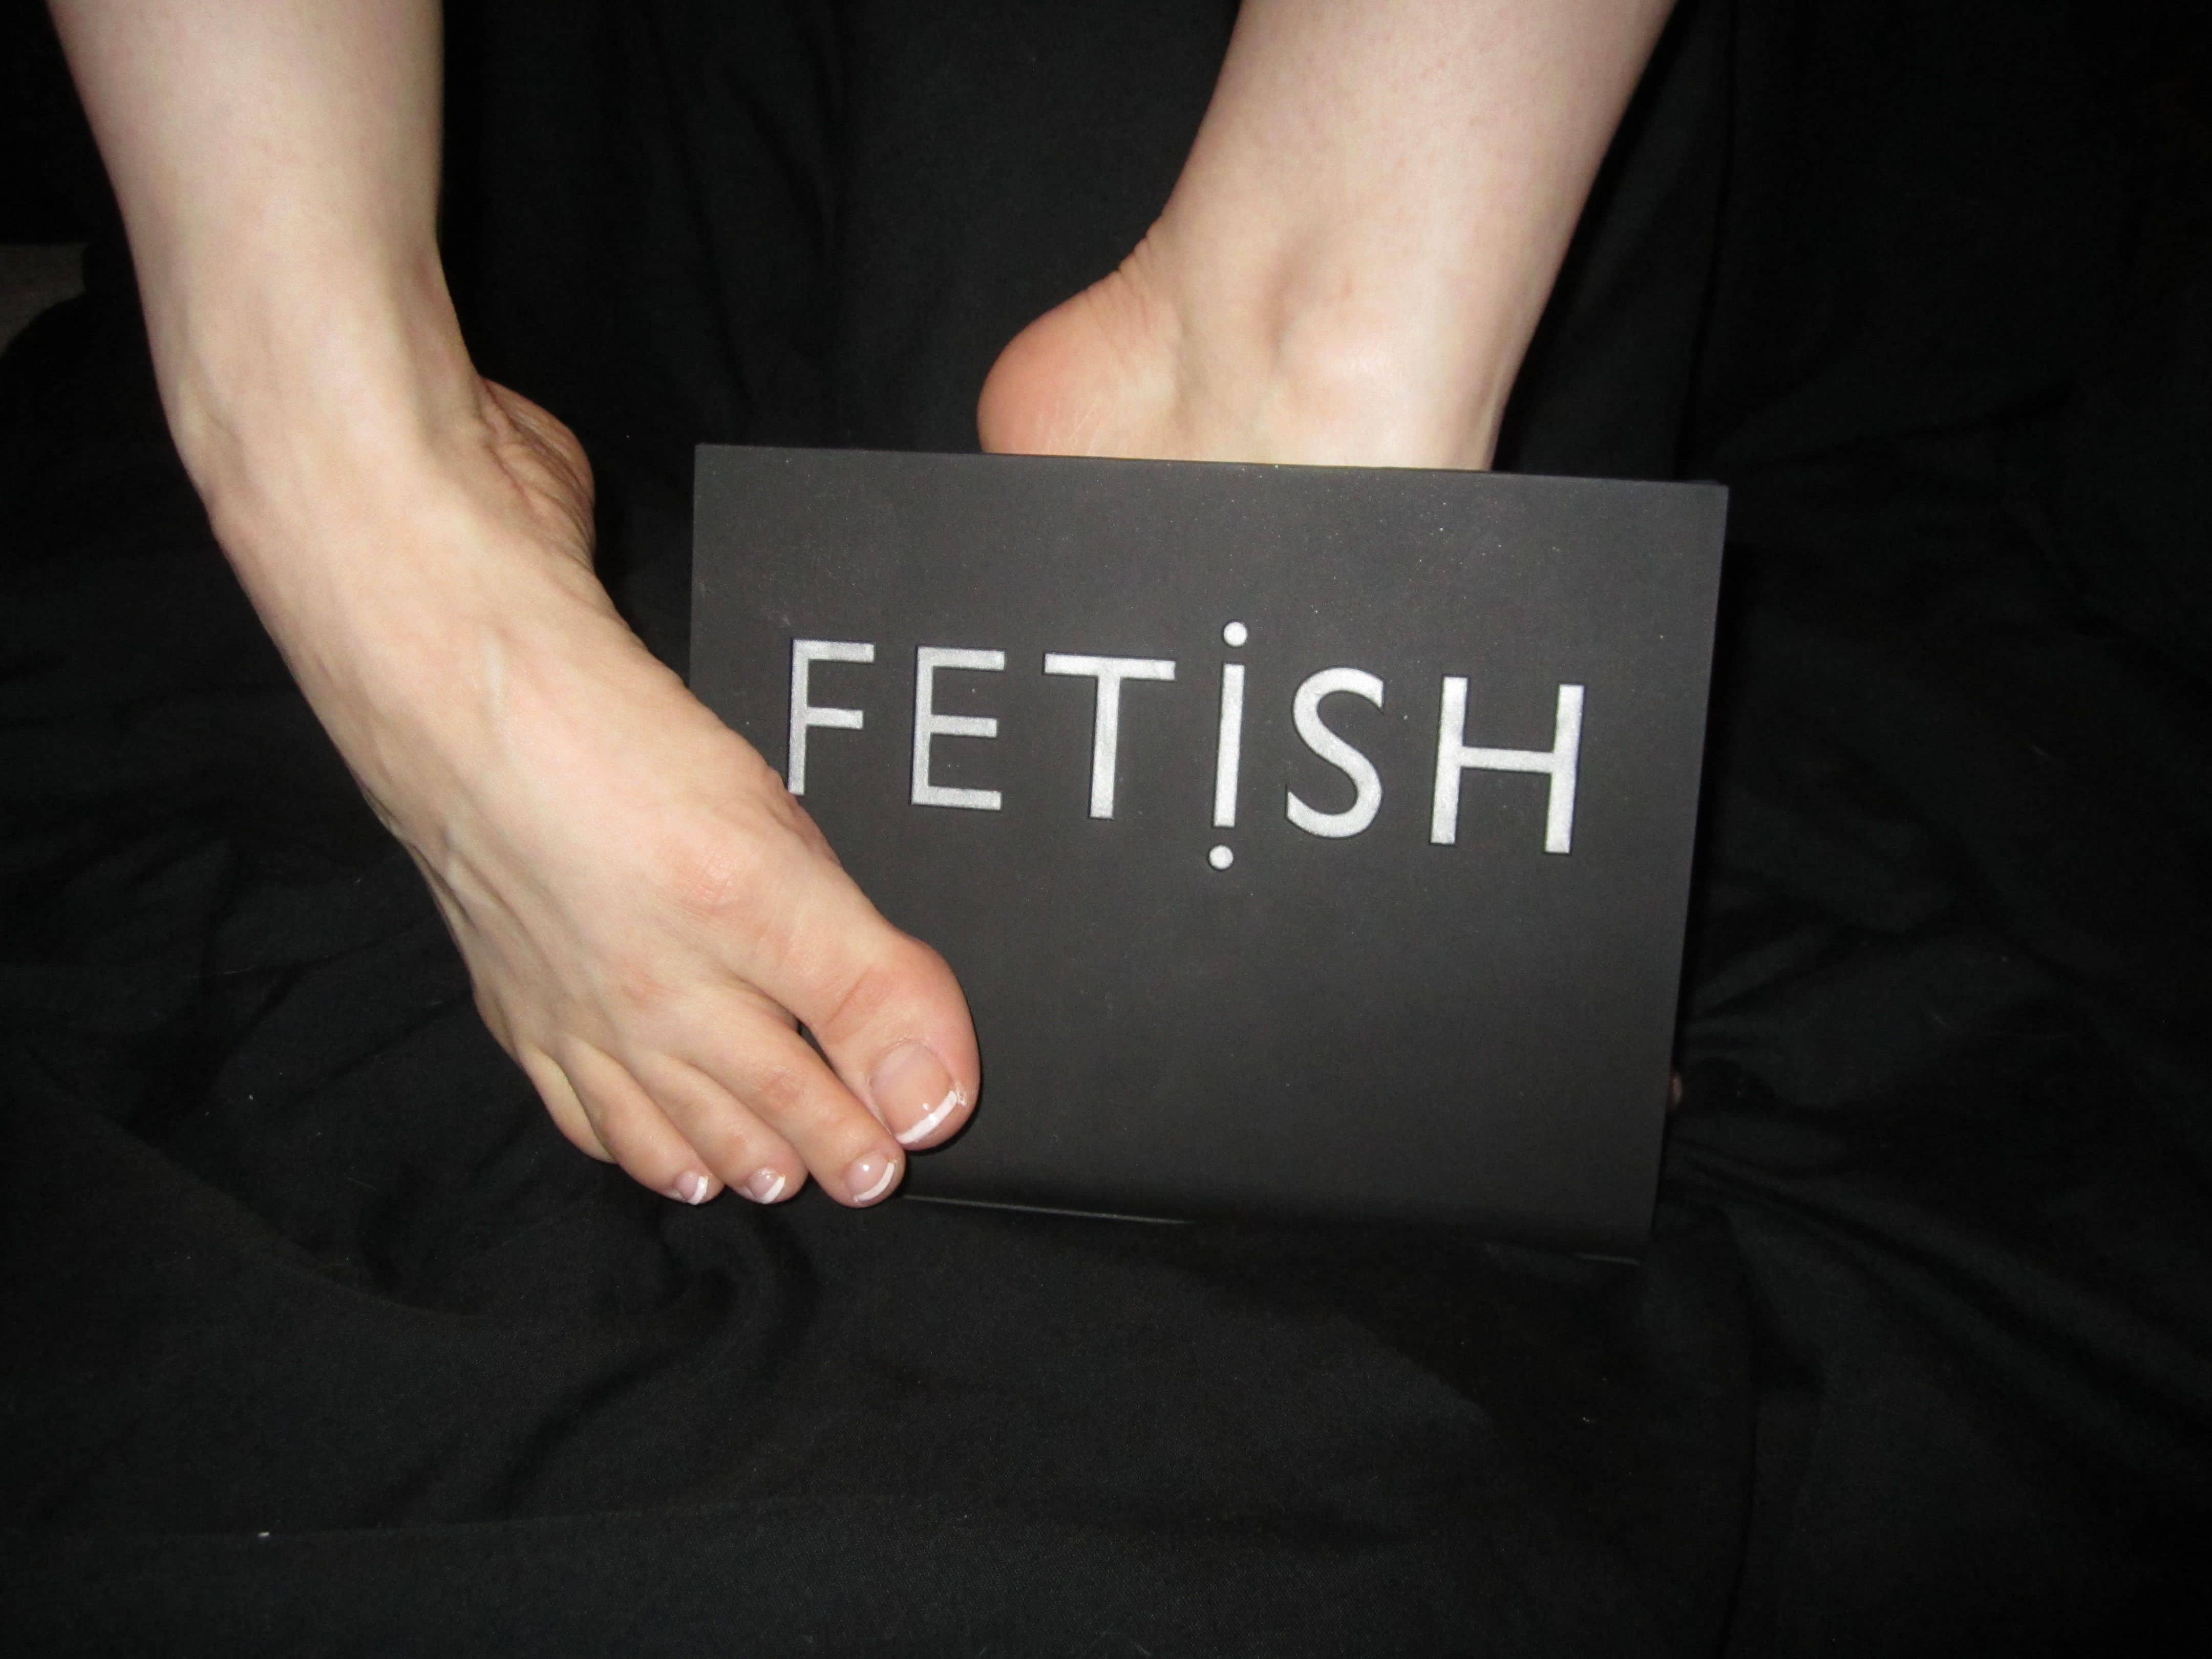 Leg torture fetish